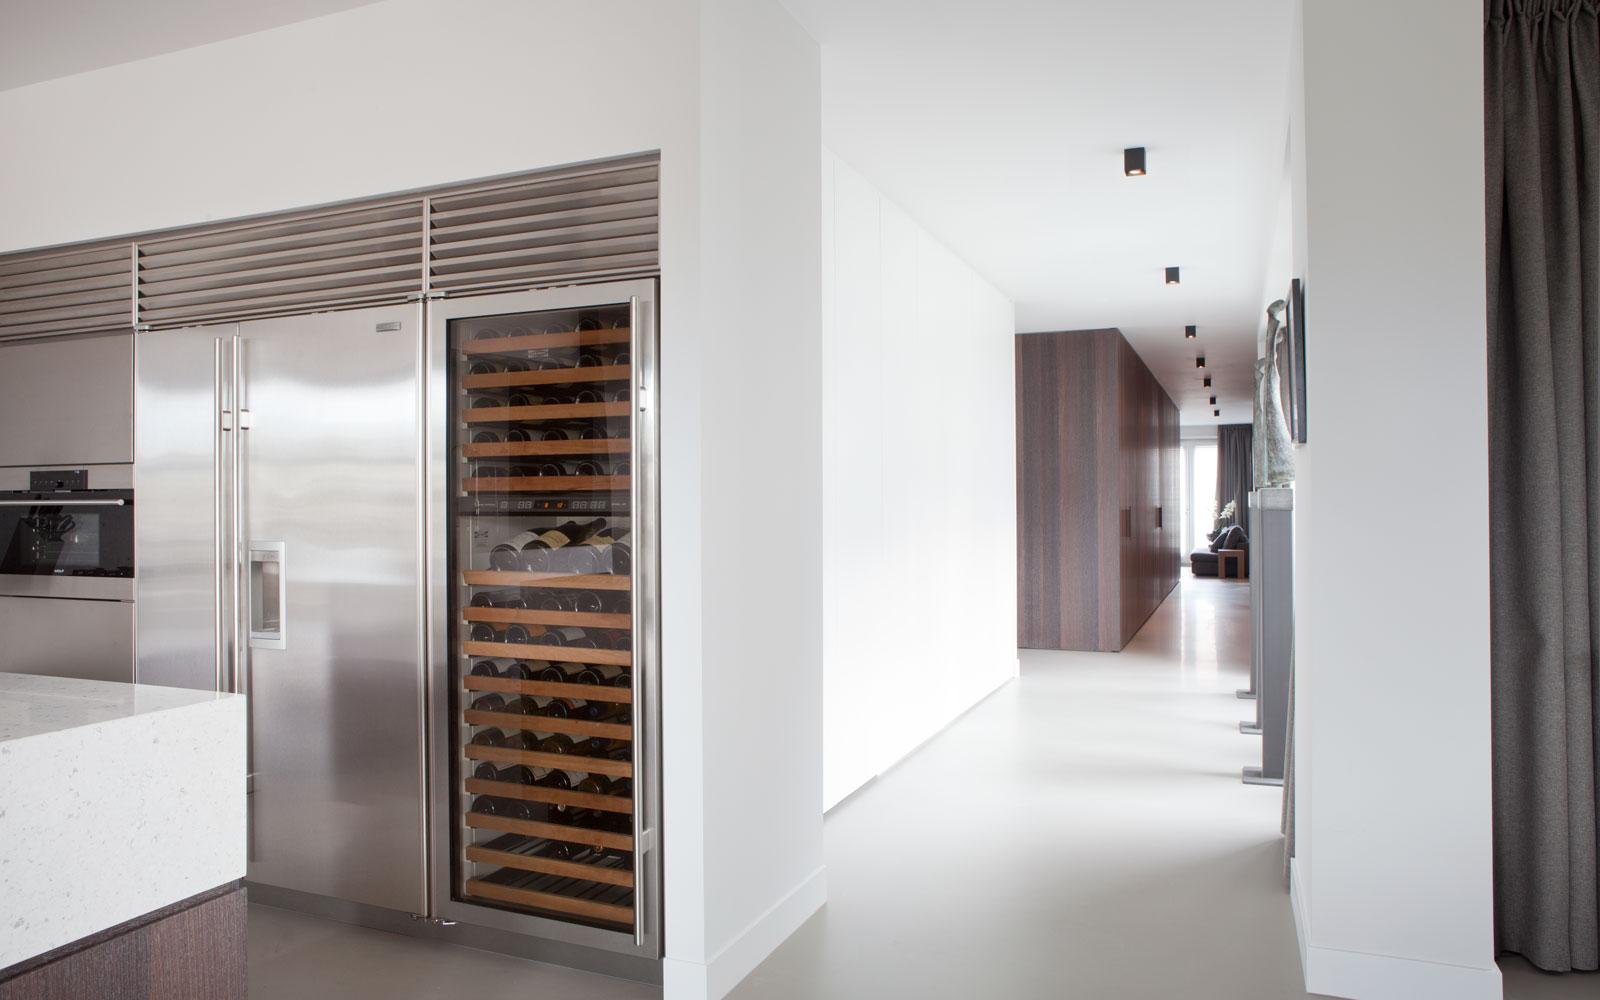 Ruime keuken, kookeiland, Subzero Wolf, wijnkoelkast, keukentafel, Penthouse Amsterdam, Remy Meijers